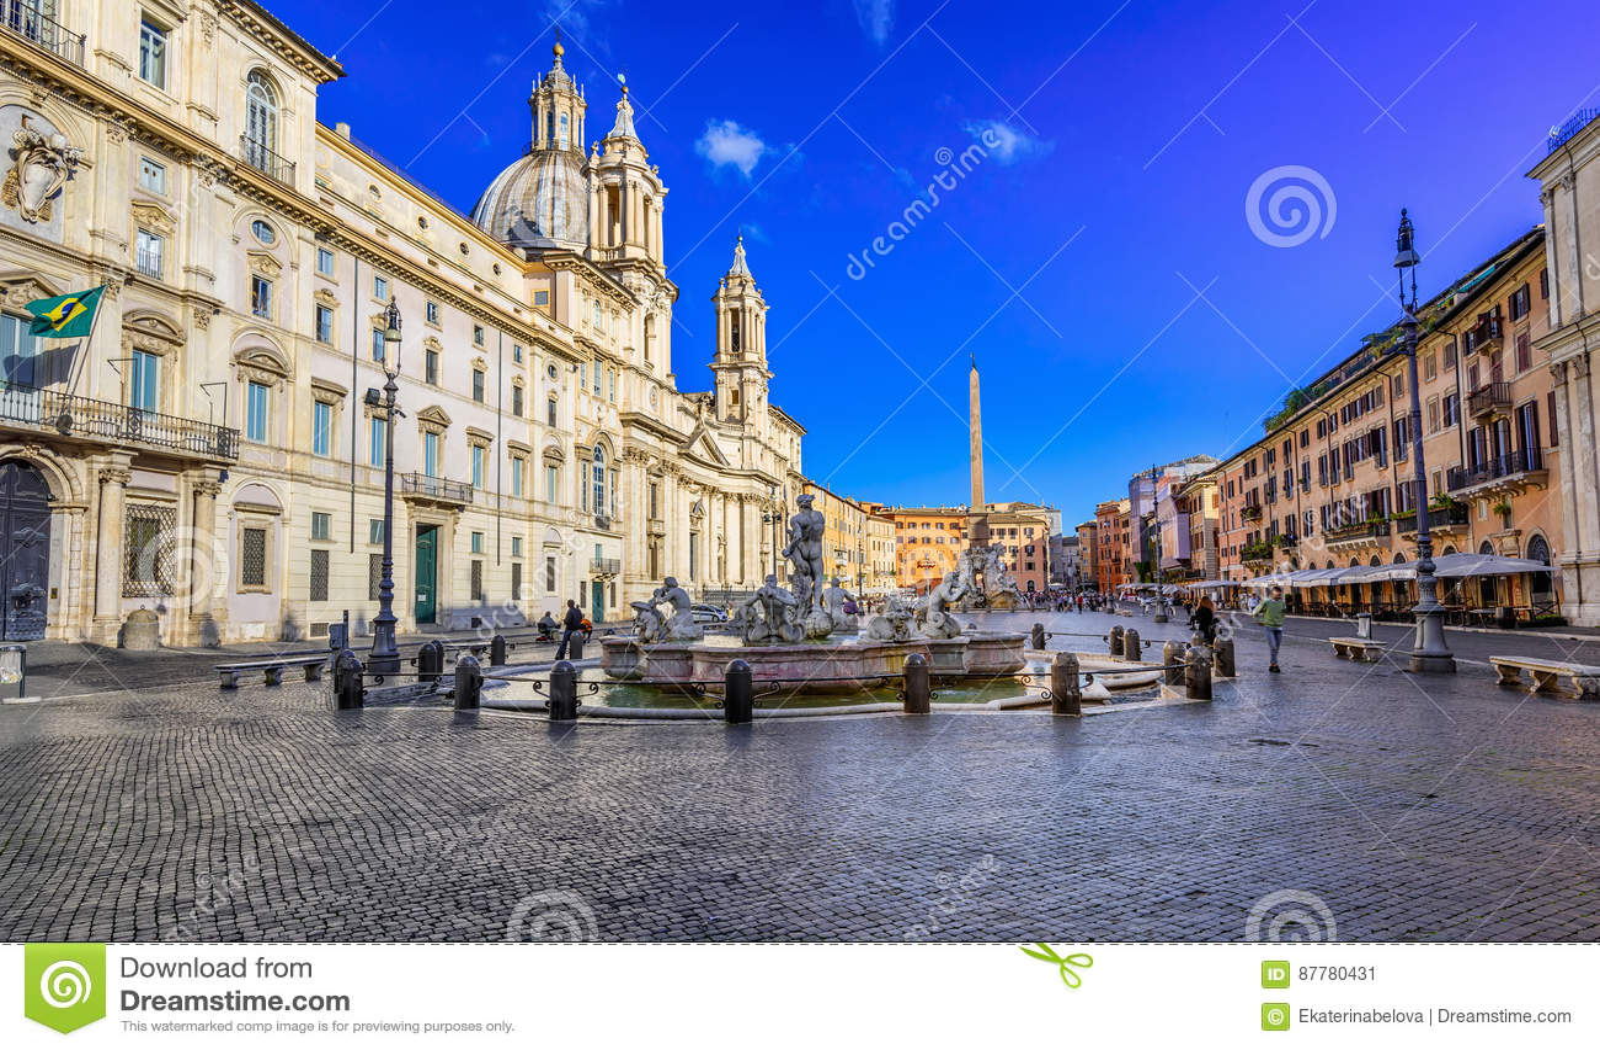 Kirche Sant Agnese im Agone, Palazzo Pamphilj und Fontanas del Moro Moor Fountain auf Marktplatz Navona in Rom